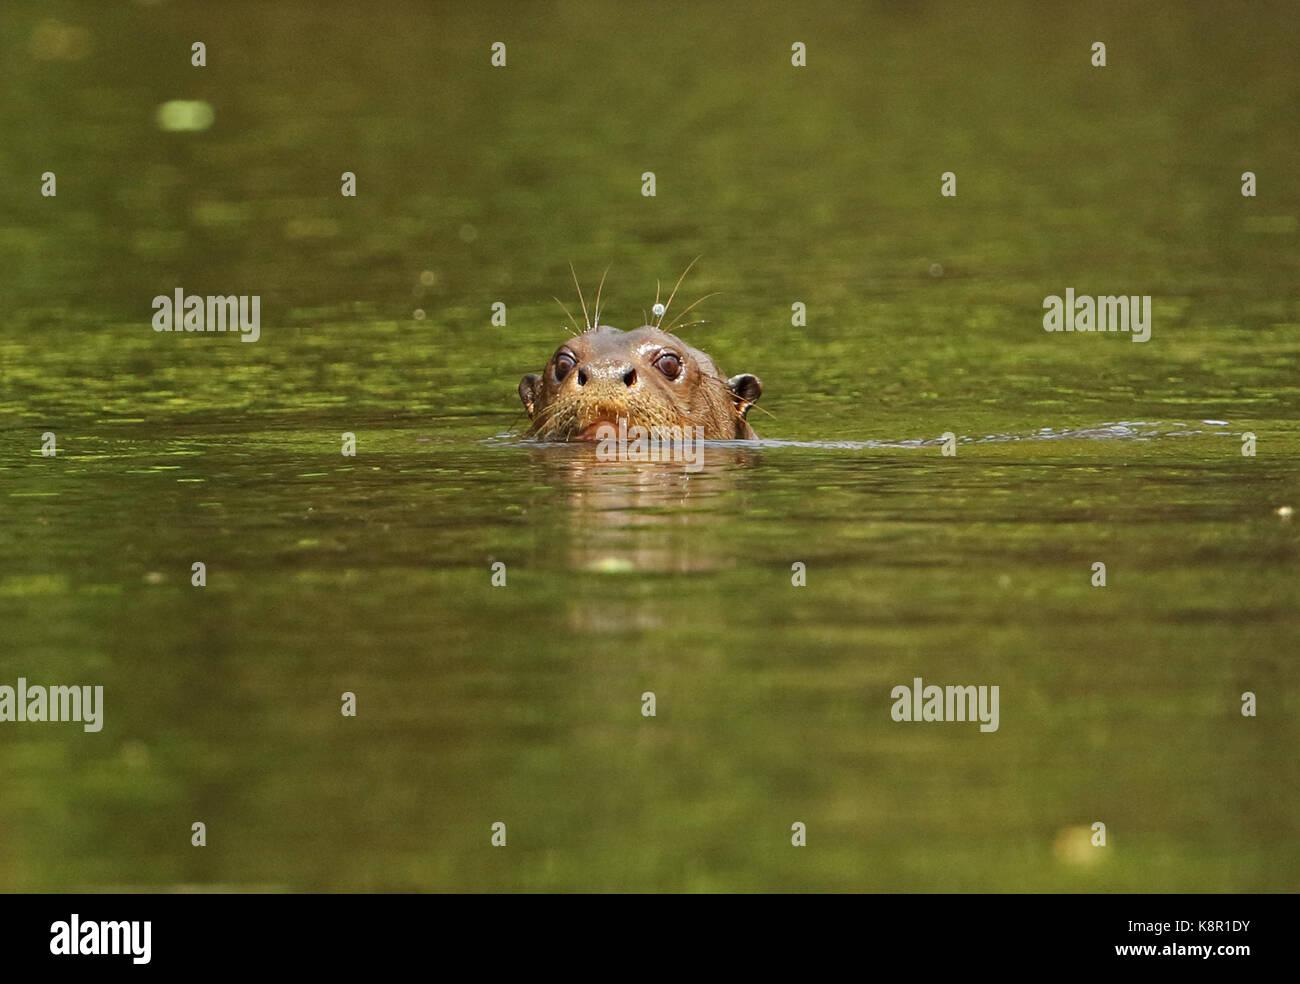 Riesenotter (Pteronura brasiliensis) erwachsenen Kopf in Fluss Inirida, Kolumbien November Stockfoto